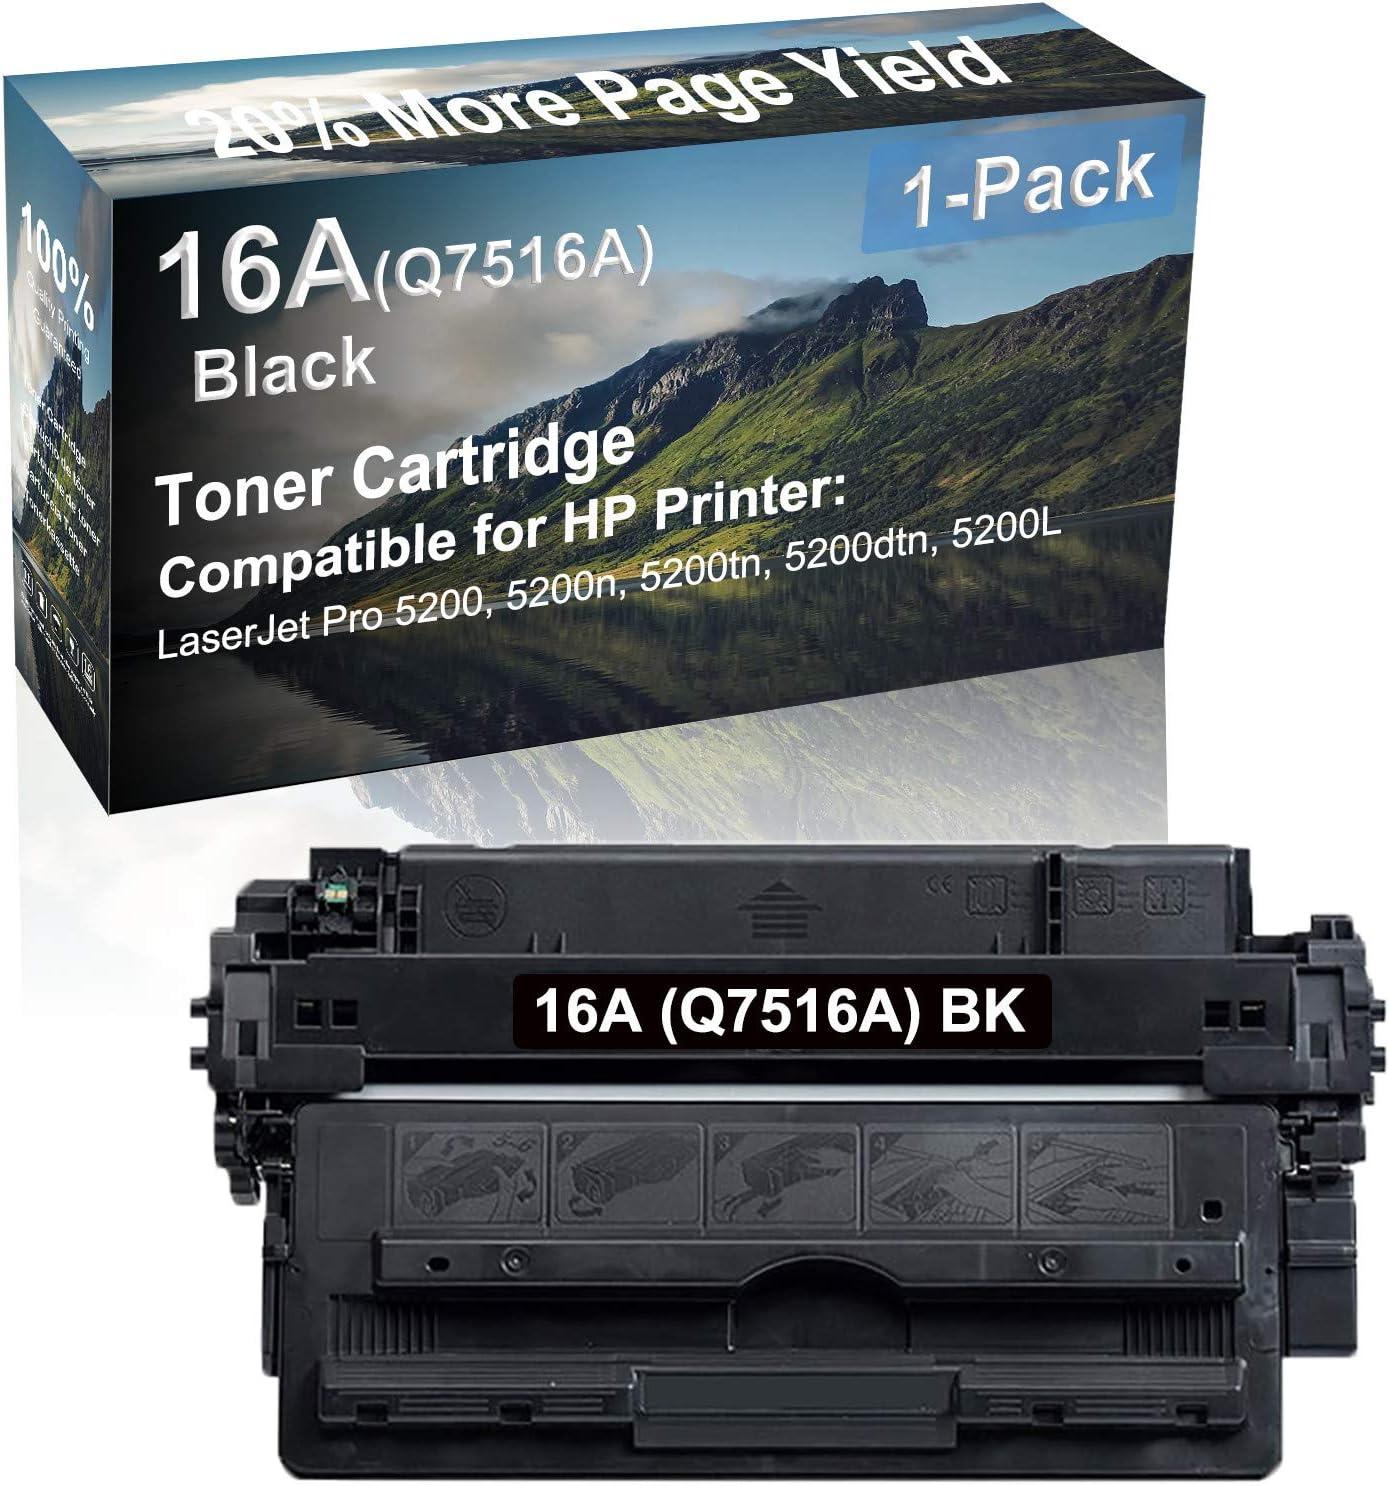 1-Pack Compatible High Capacity 5200, 5200n, 5200tn, 5200dtn, 5200L Printer Toner Cartridge Replacement for HP (Q7516A) 16A Toner Cartridge (Black)